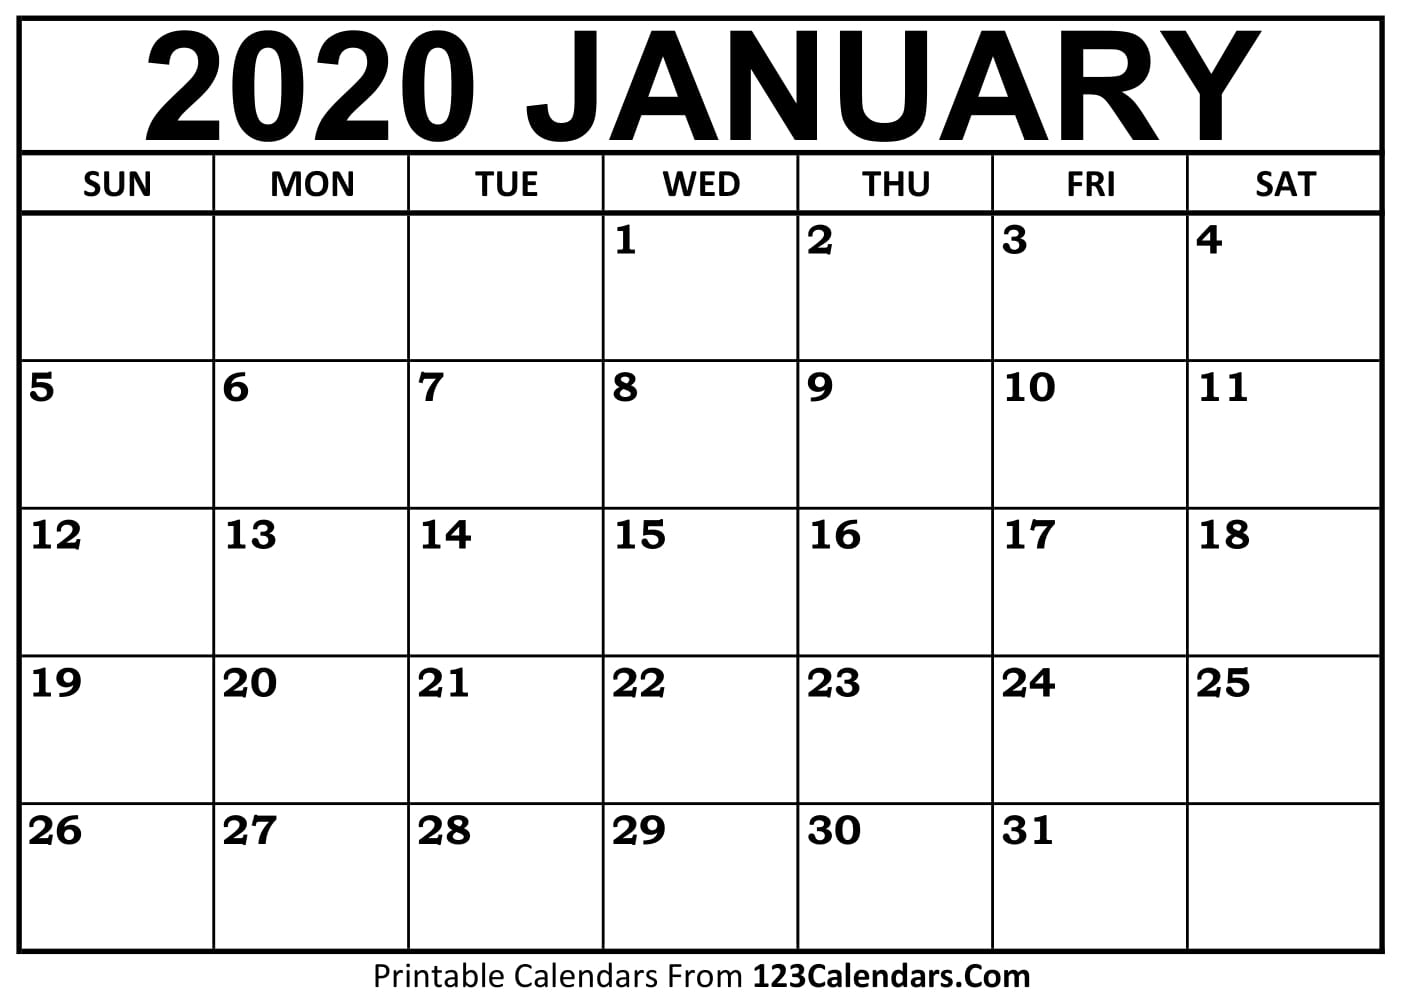 January 2020 Printable Calendar | 123Calendars